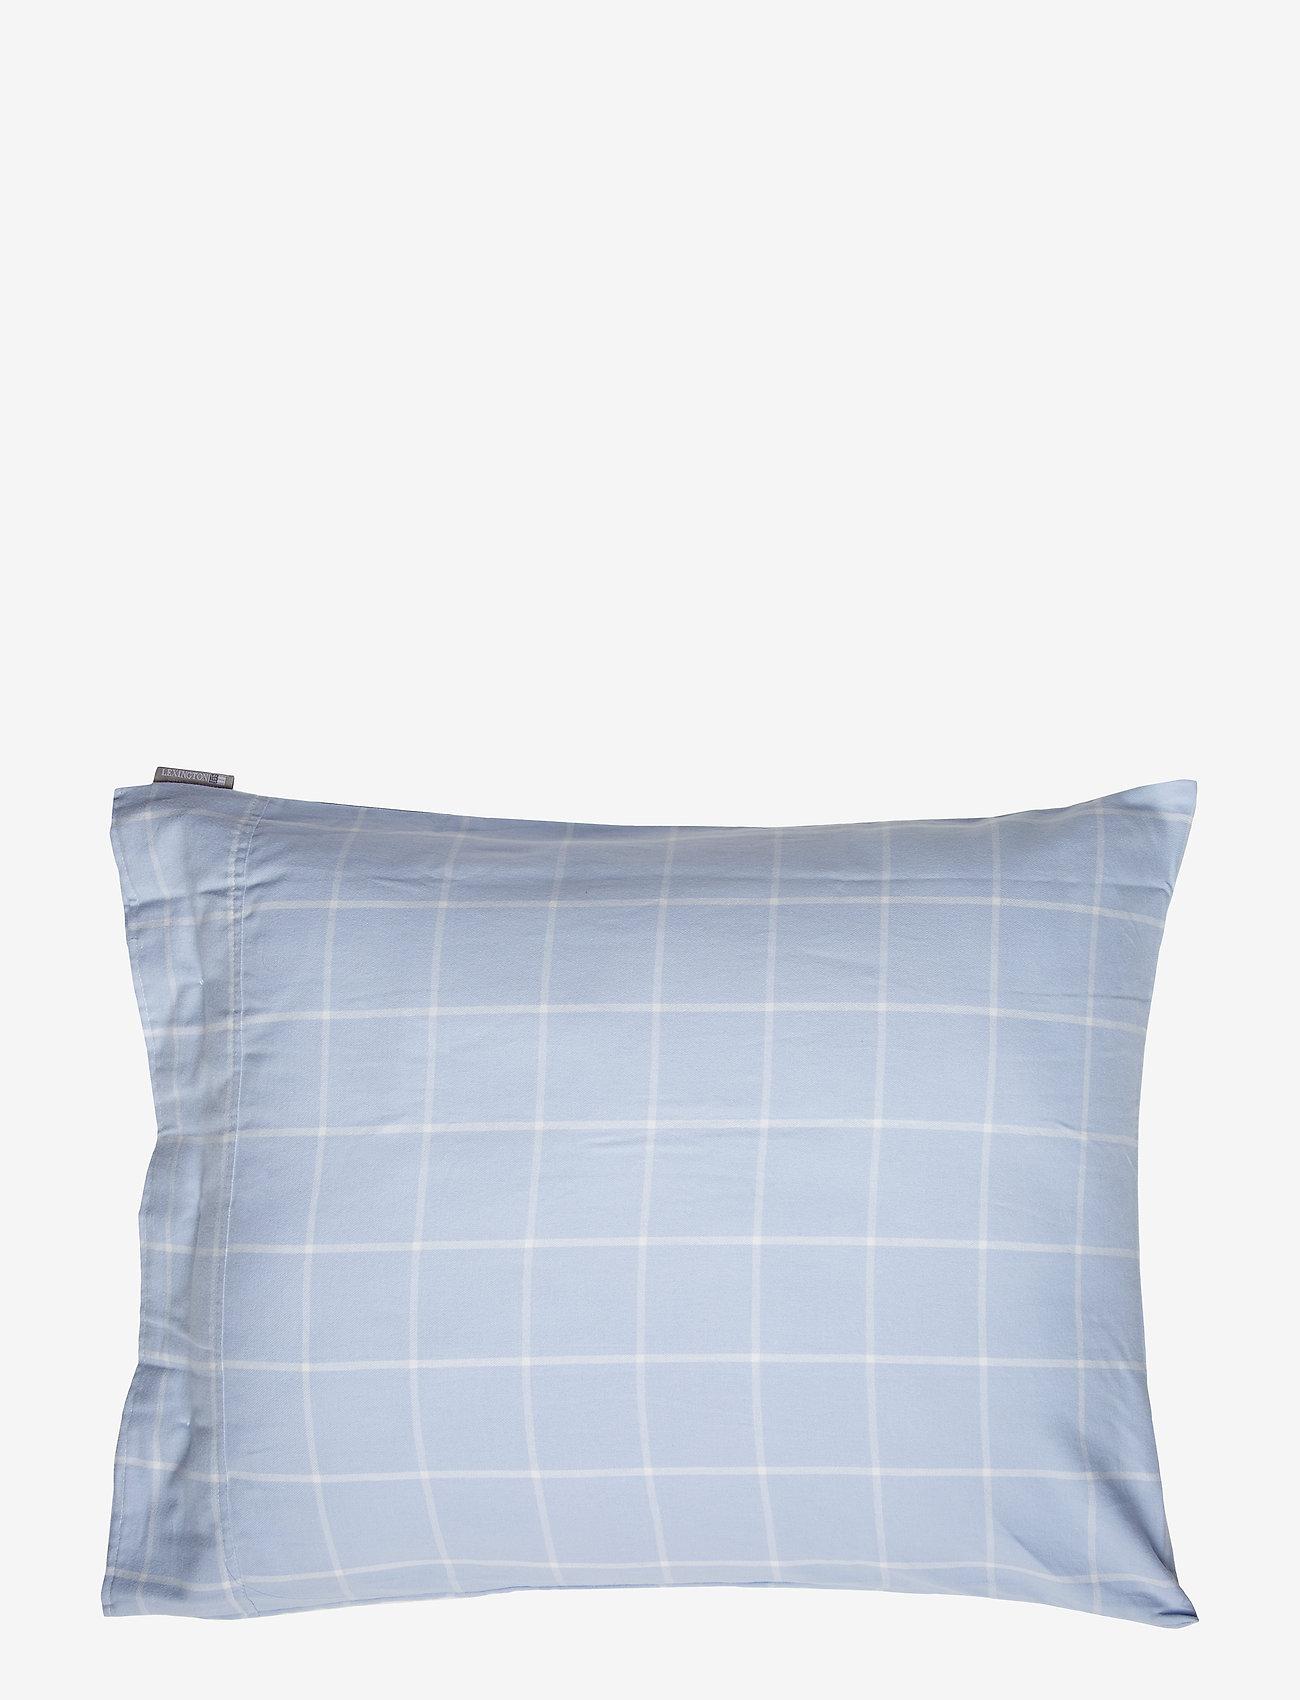 Lexington Home - Hotel Light Flannel Lt Blue/White Pillowcase - taies d'oreiller - lt blue/white - 1